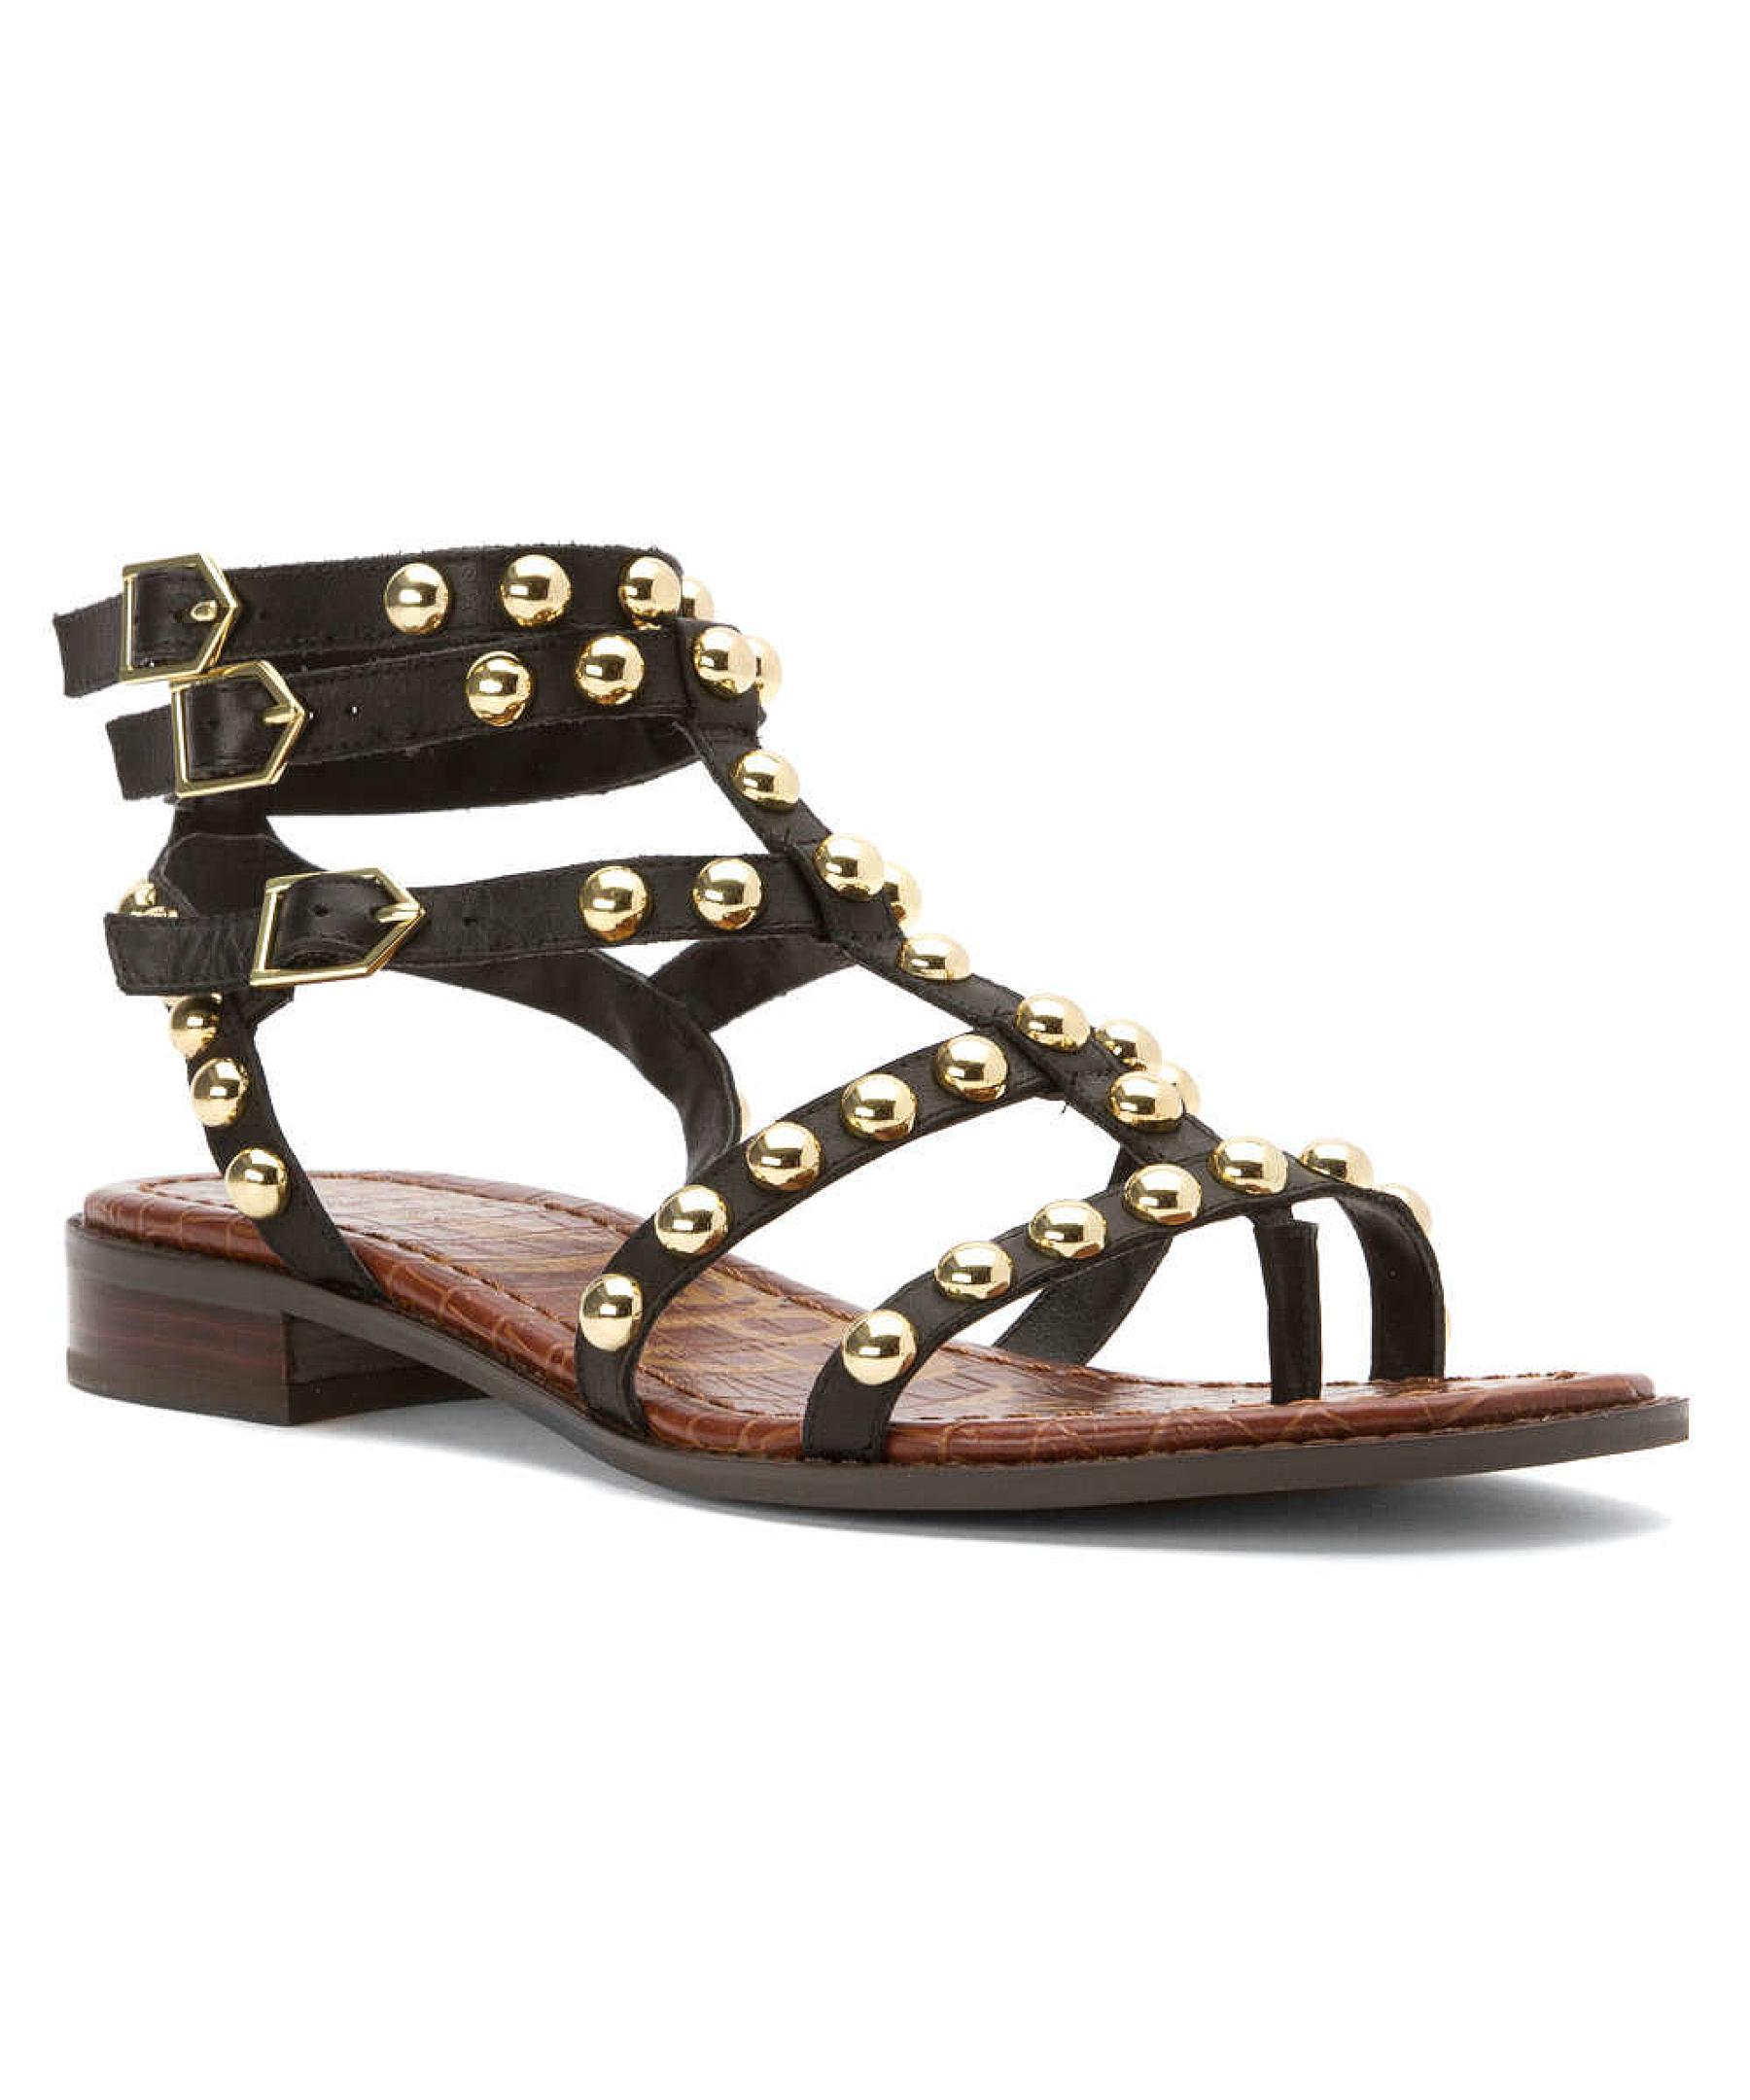 Sam Edelman Women S Eavan Sandals In Brown Black Lyst